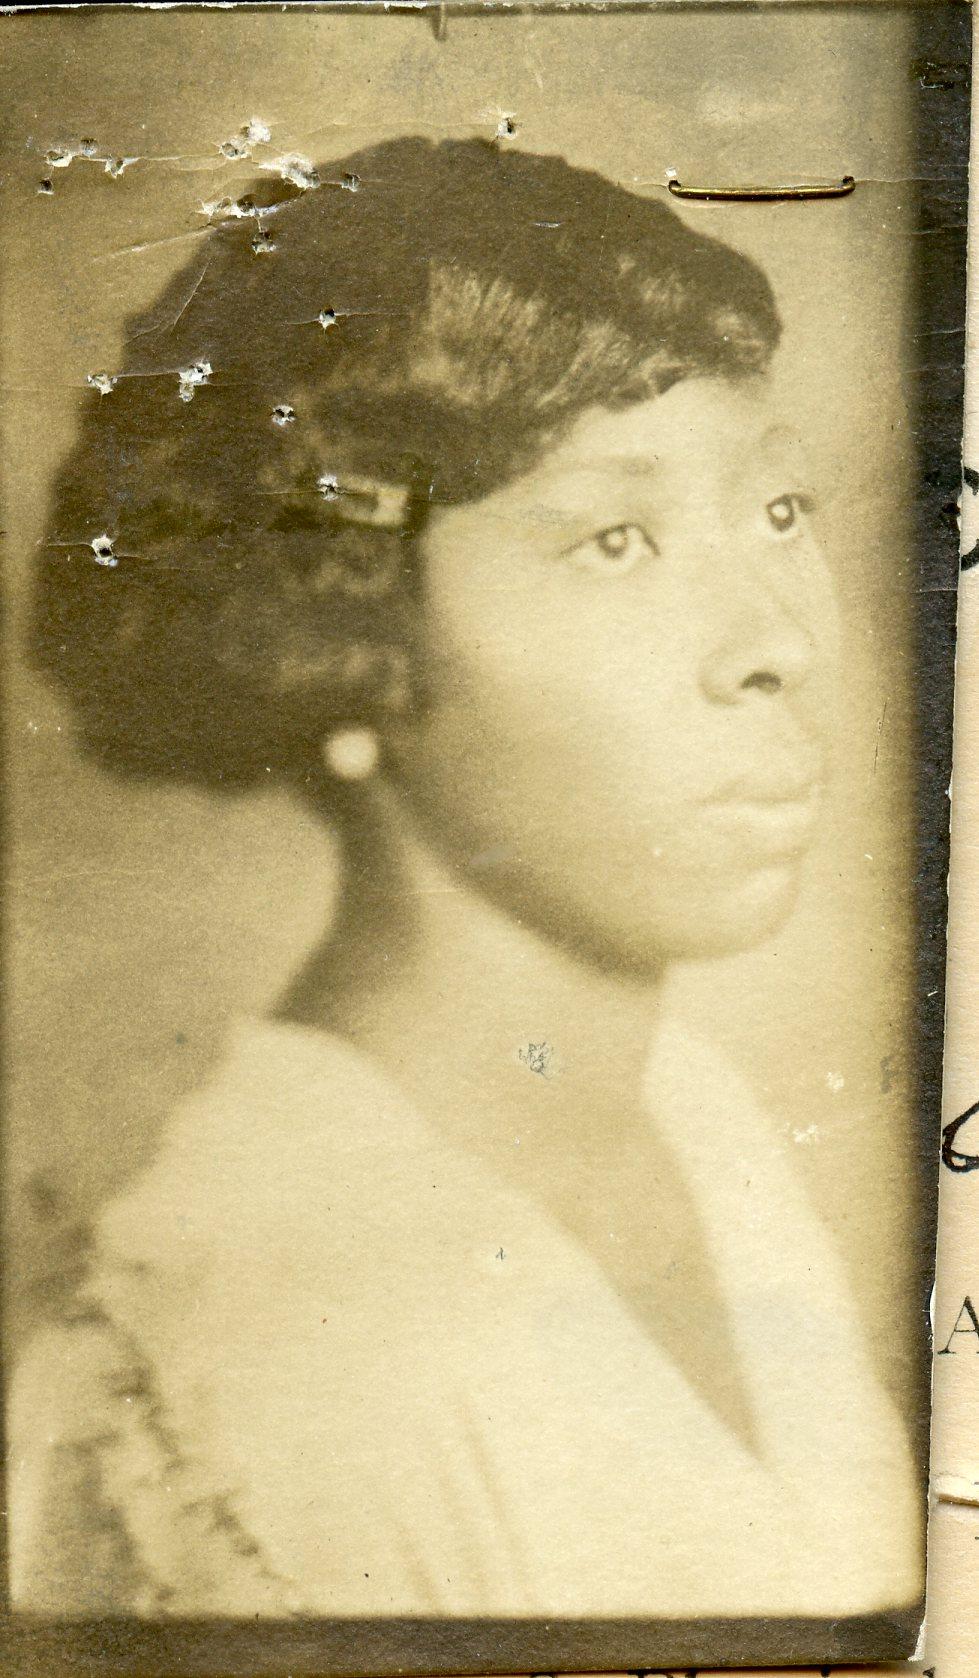 Ms. Lola Jackson